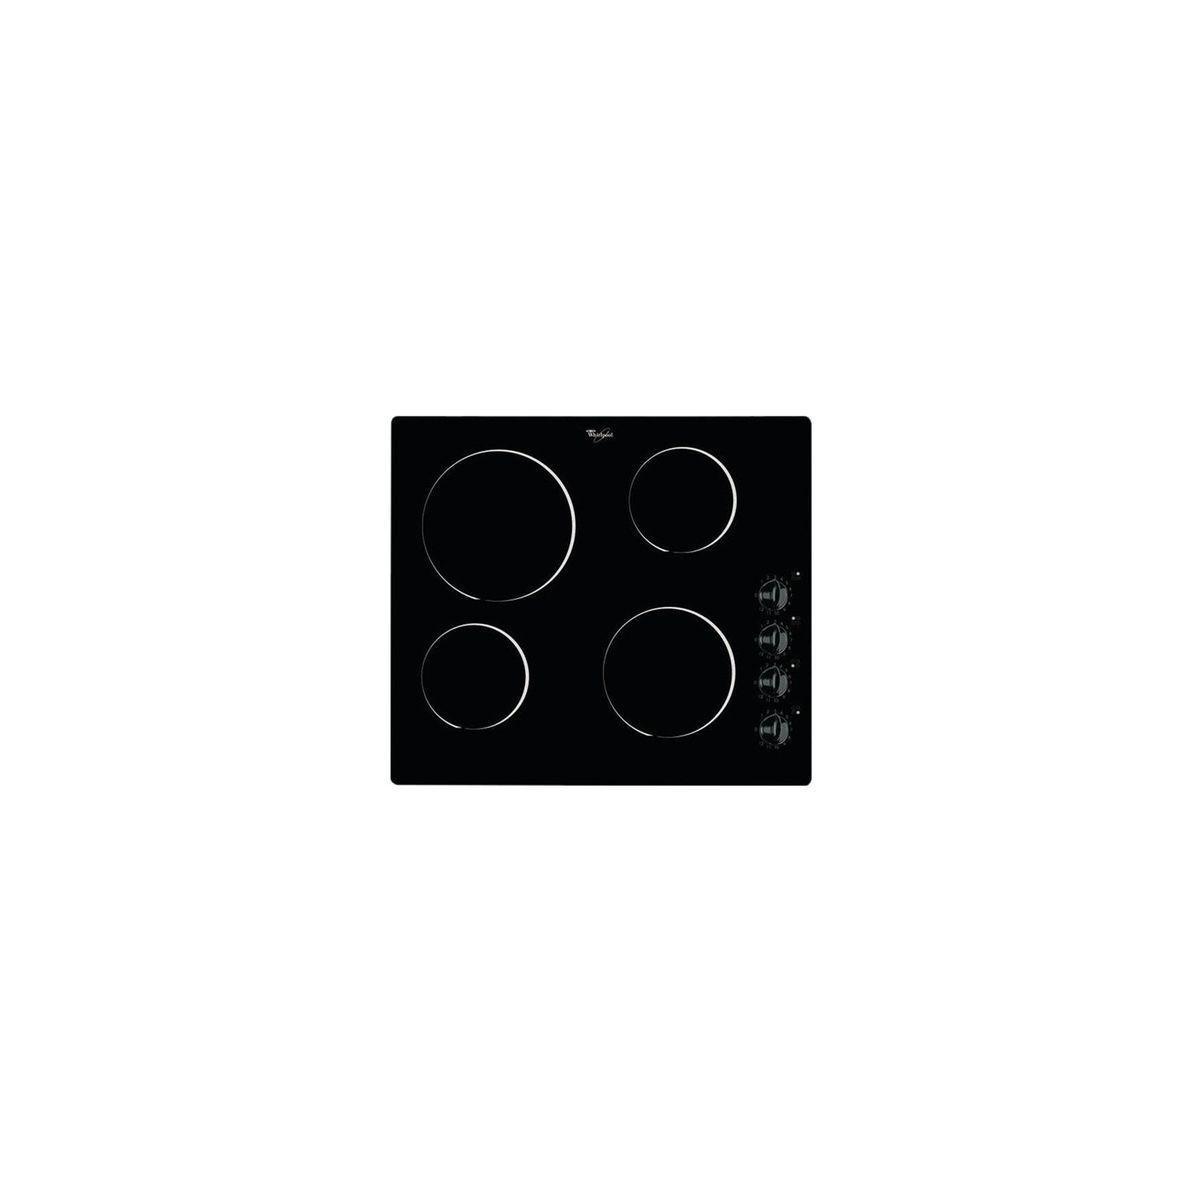 Table vitrocéramique WHIRLPOOL AKM903NE